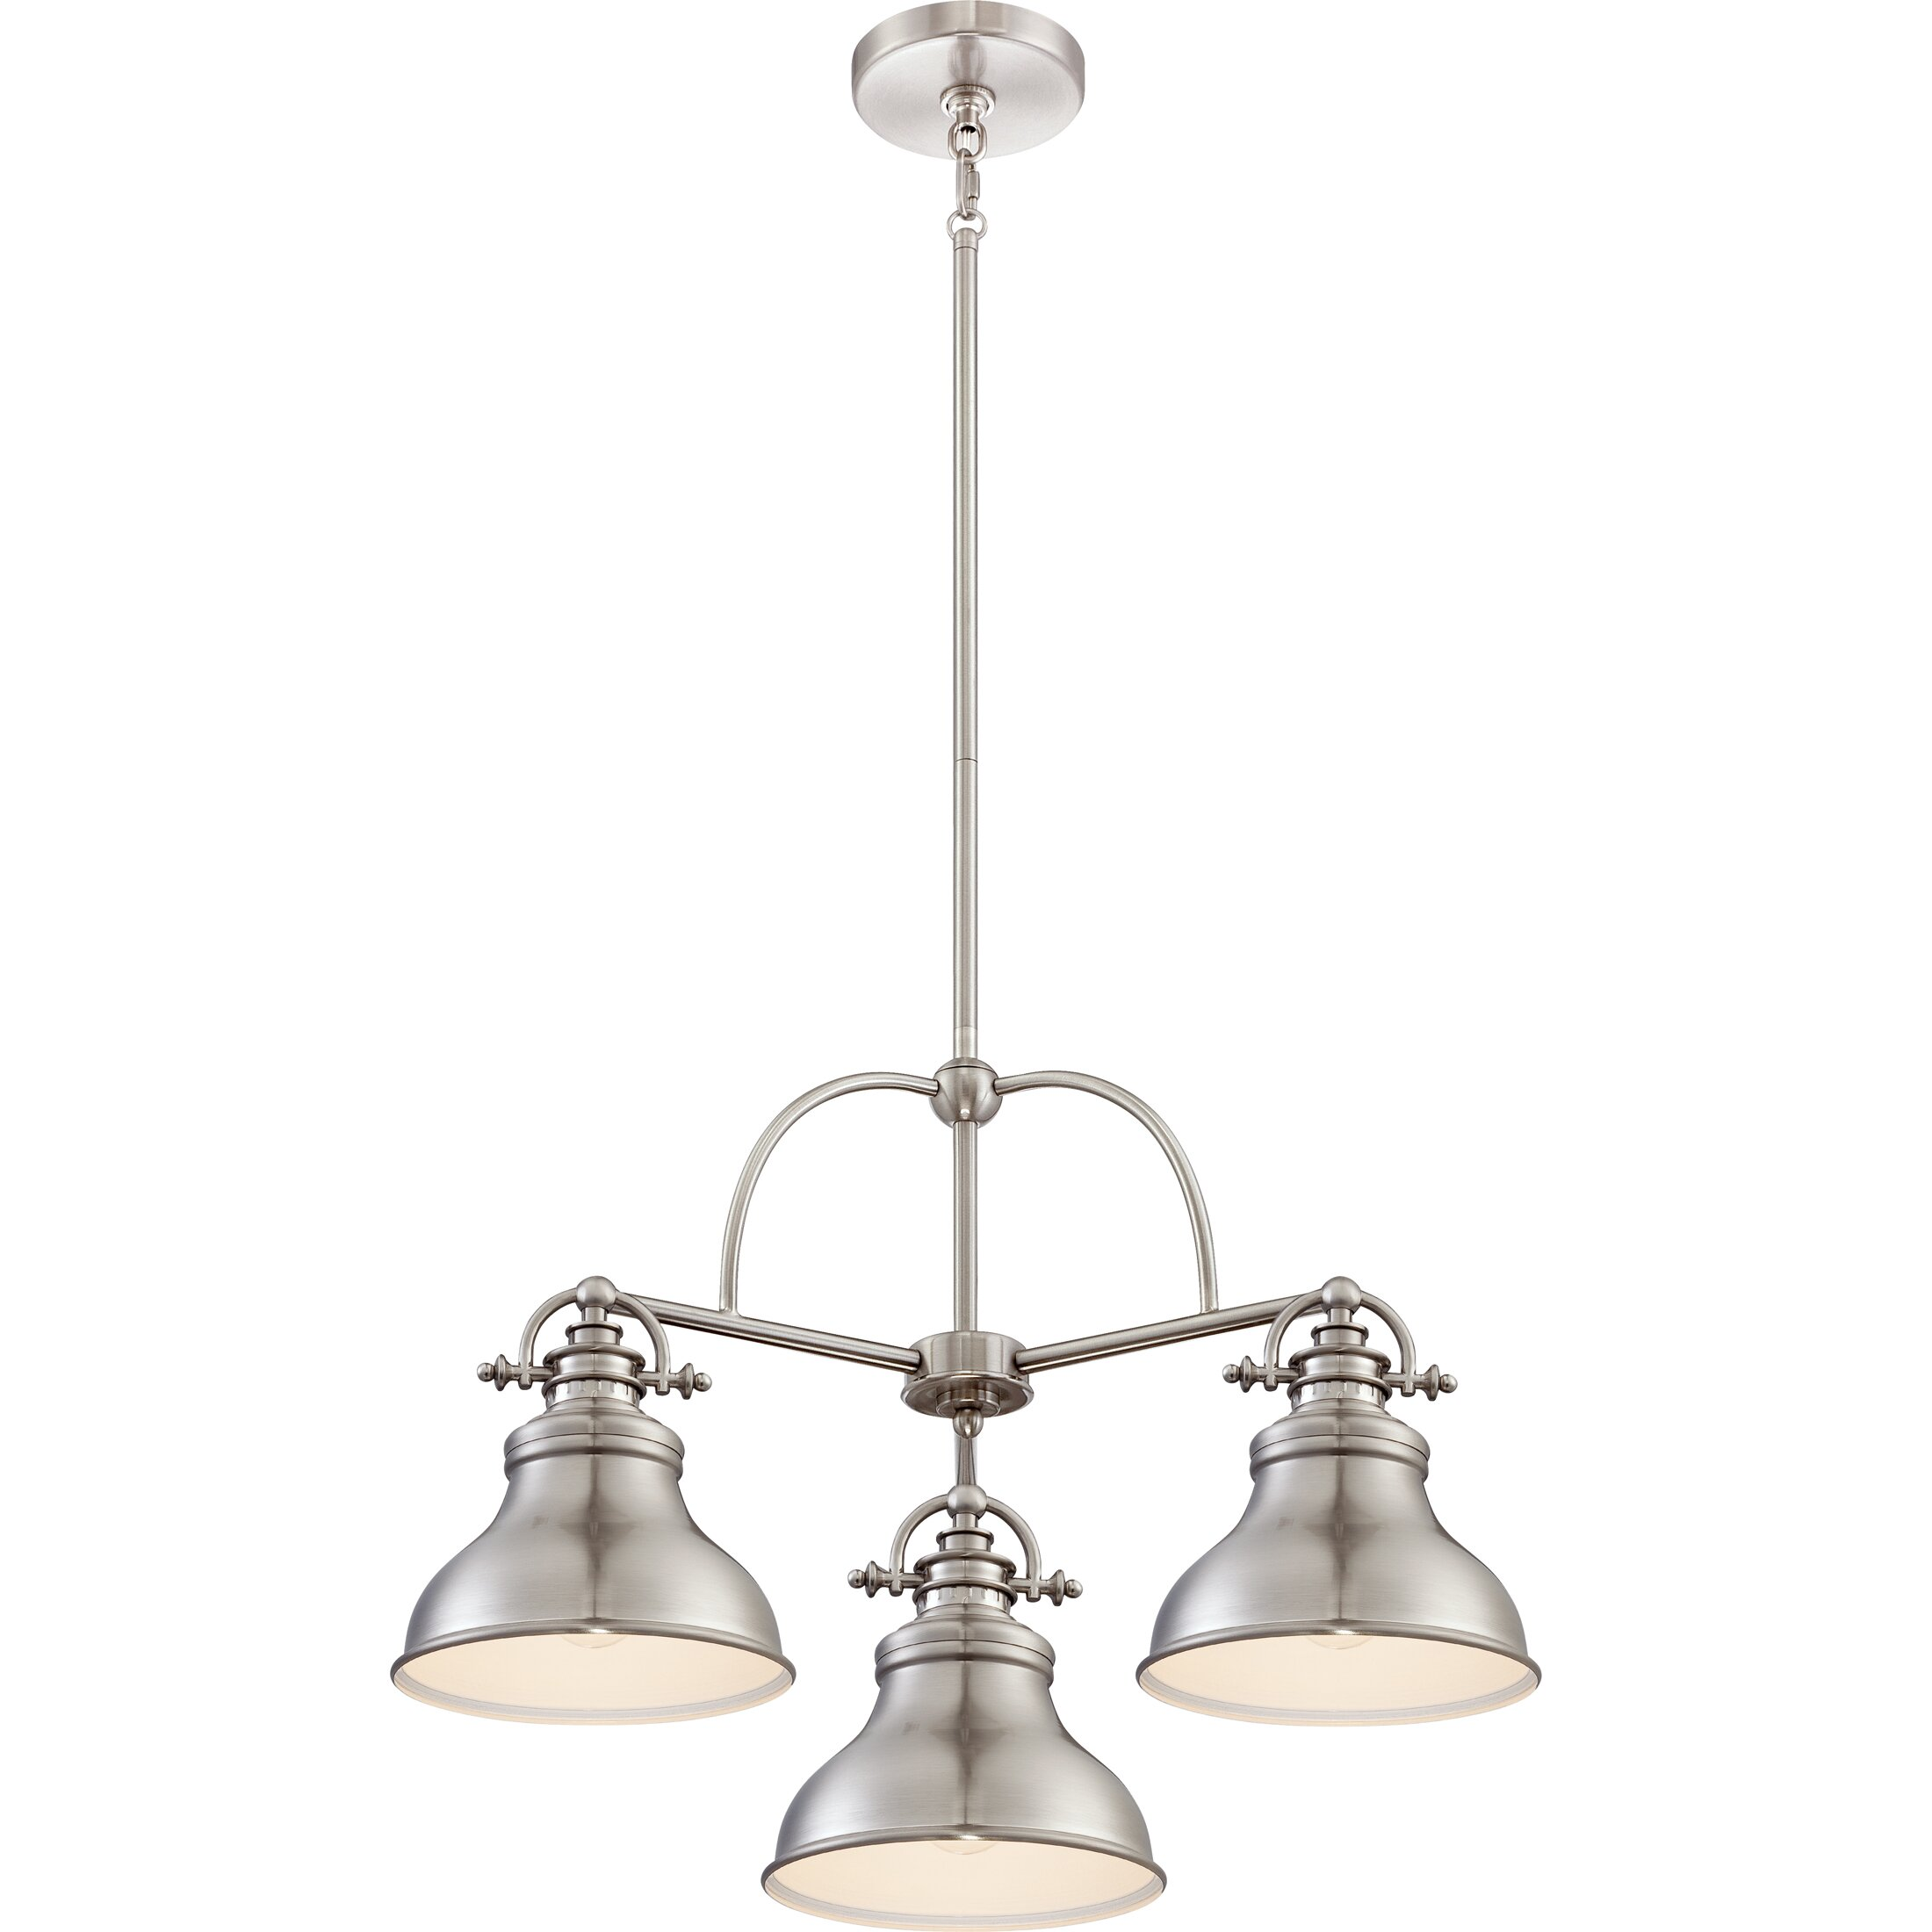 3 Light Pendant Island Kitchen Lighting Trent Austin Design Cetona 3 Light Kitchen Island Pendant